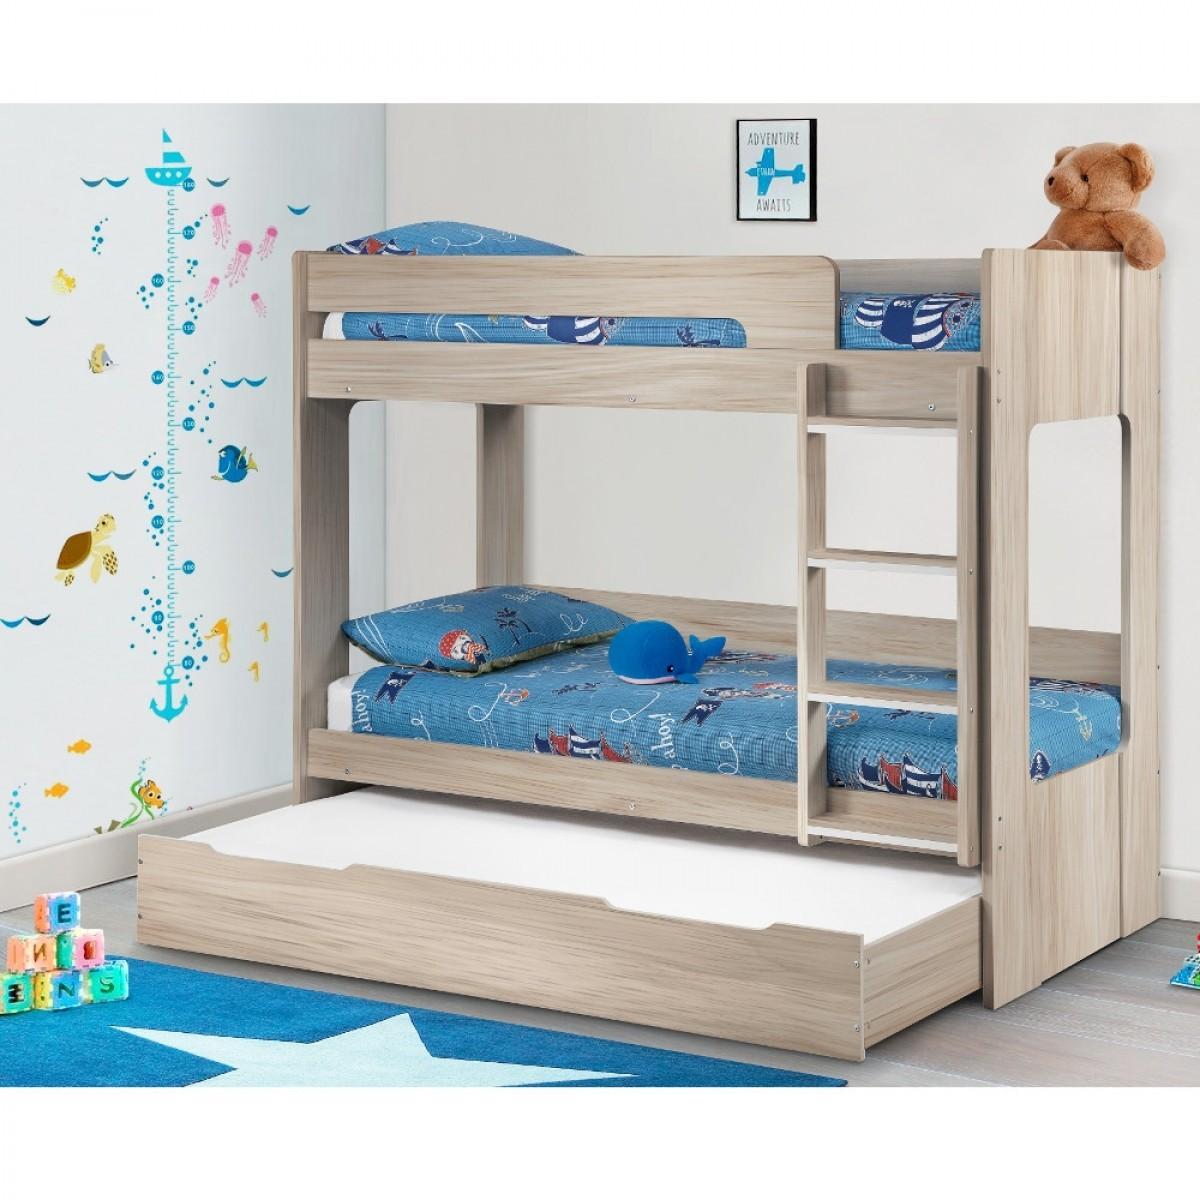 Ellie Oak Wooden Bunk Bed and Trundle Guest Bed/Underbed Storage Drawer